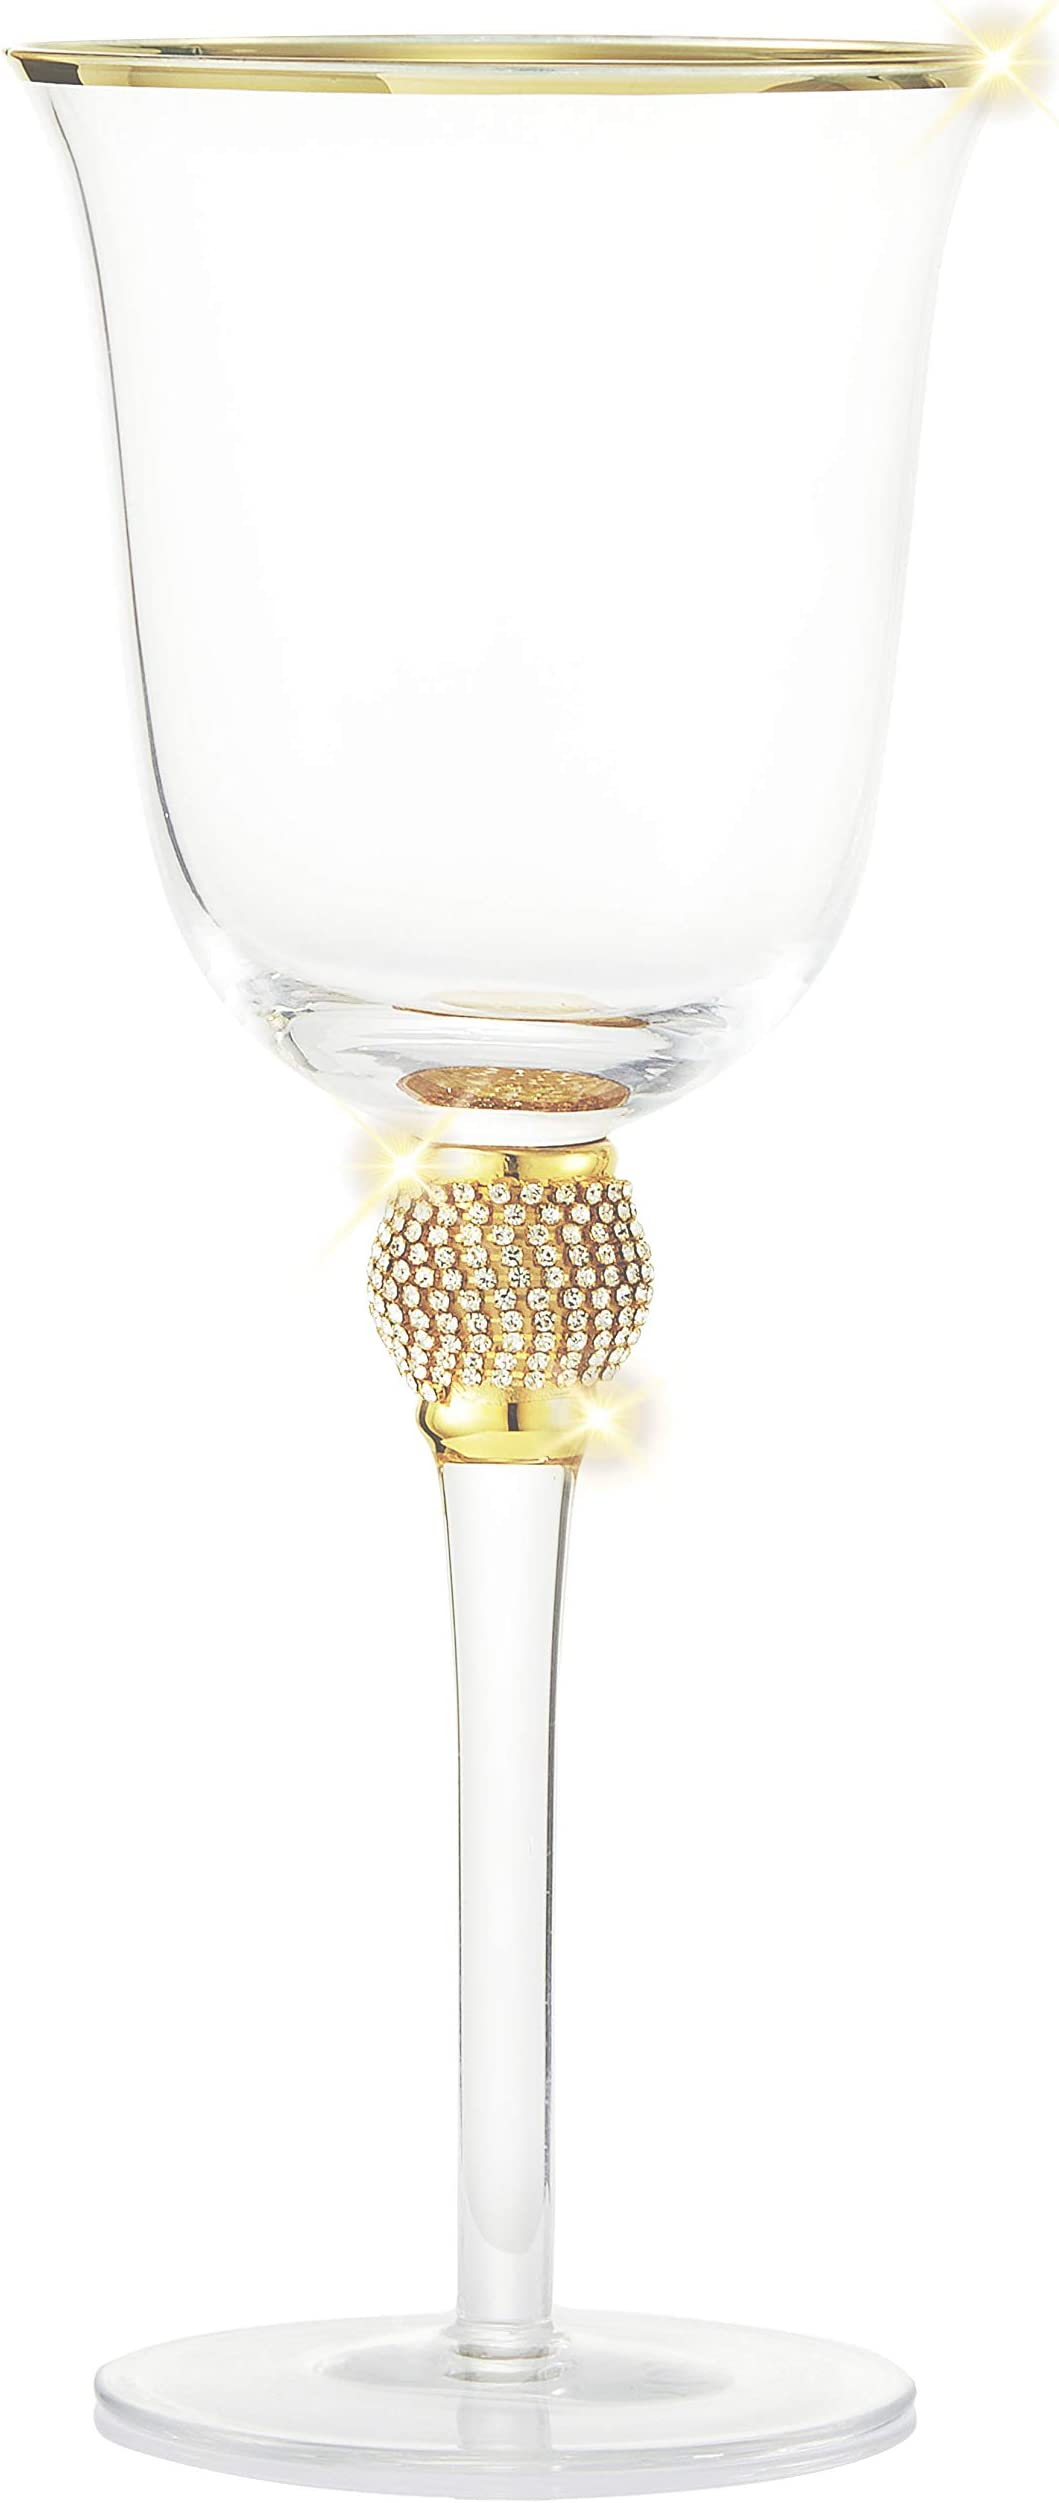 Bulk 50 Wine Glass Charms Champagne Flute 20 x 6 mm Antique Silver Tone  ts1114